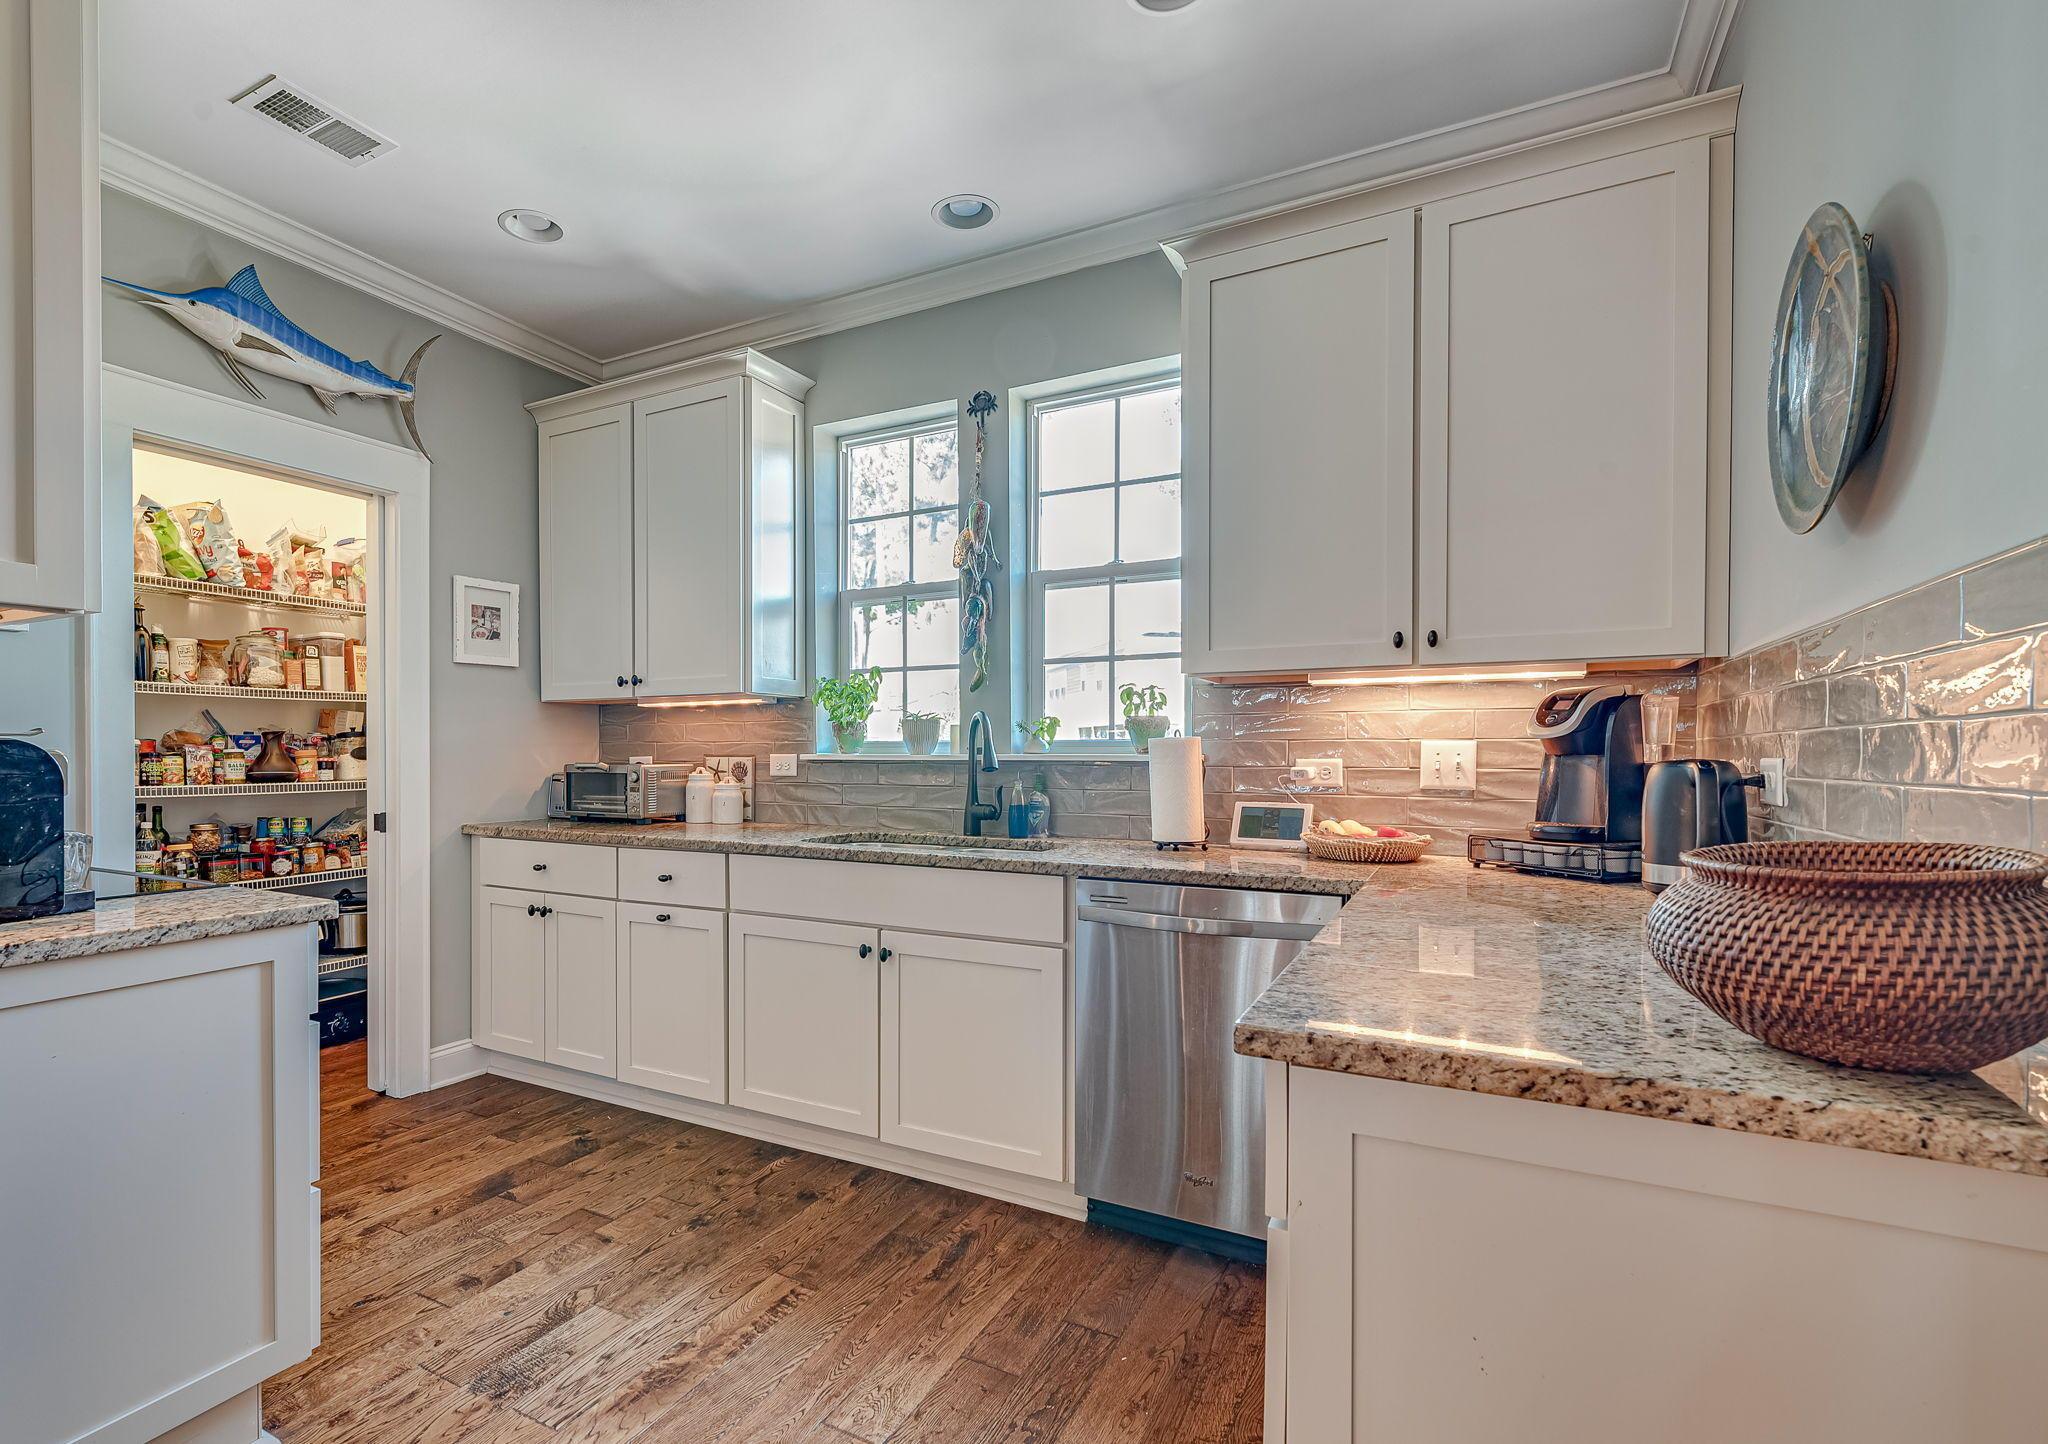 Etiwan Pointe Homes For Sale - 159 Slipper Shell, Mount Pleasant, SC - 24